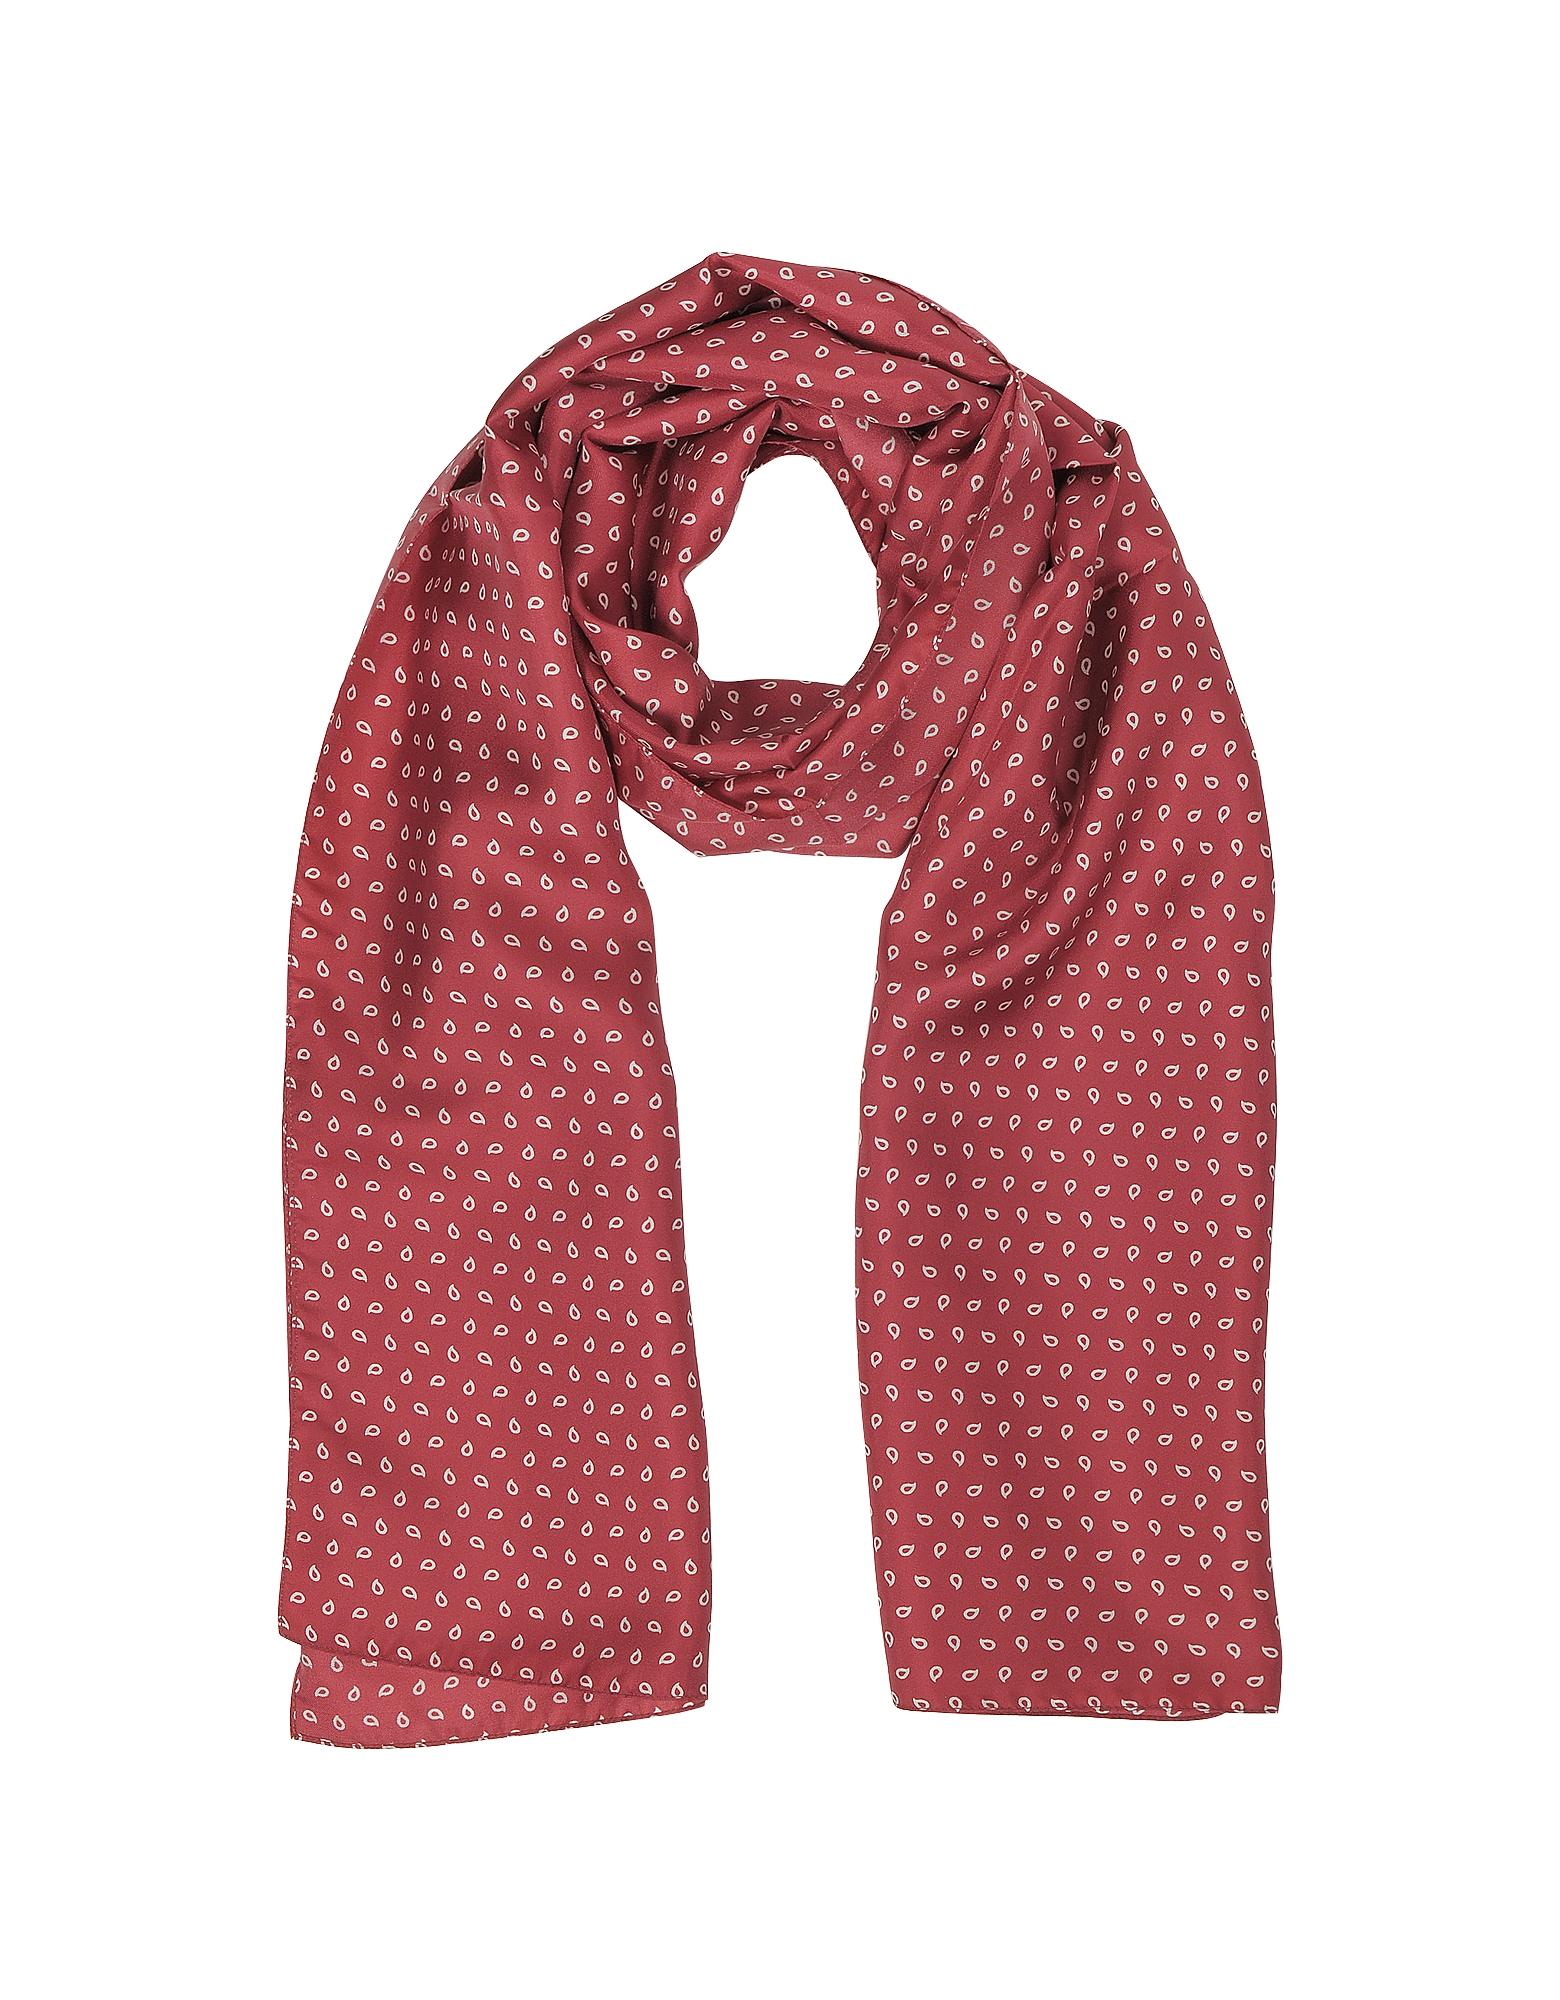 Image of Forzieri Designer Men's Scarves, Small Paisley Print Twill Silk Men's Scarf